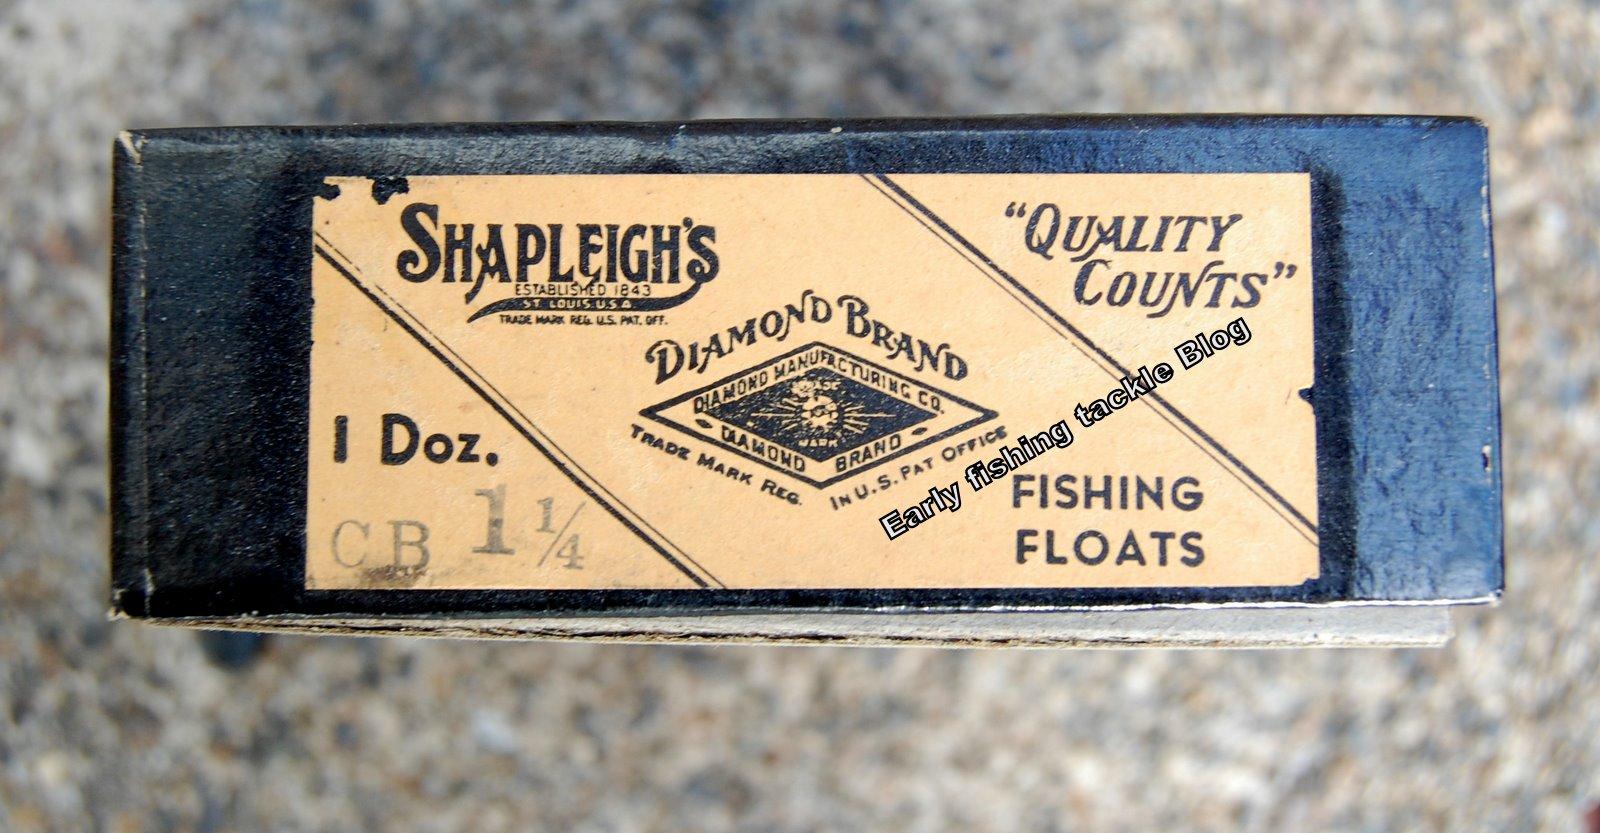 1950's era Carolina Washboard Float catalog advertisments